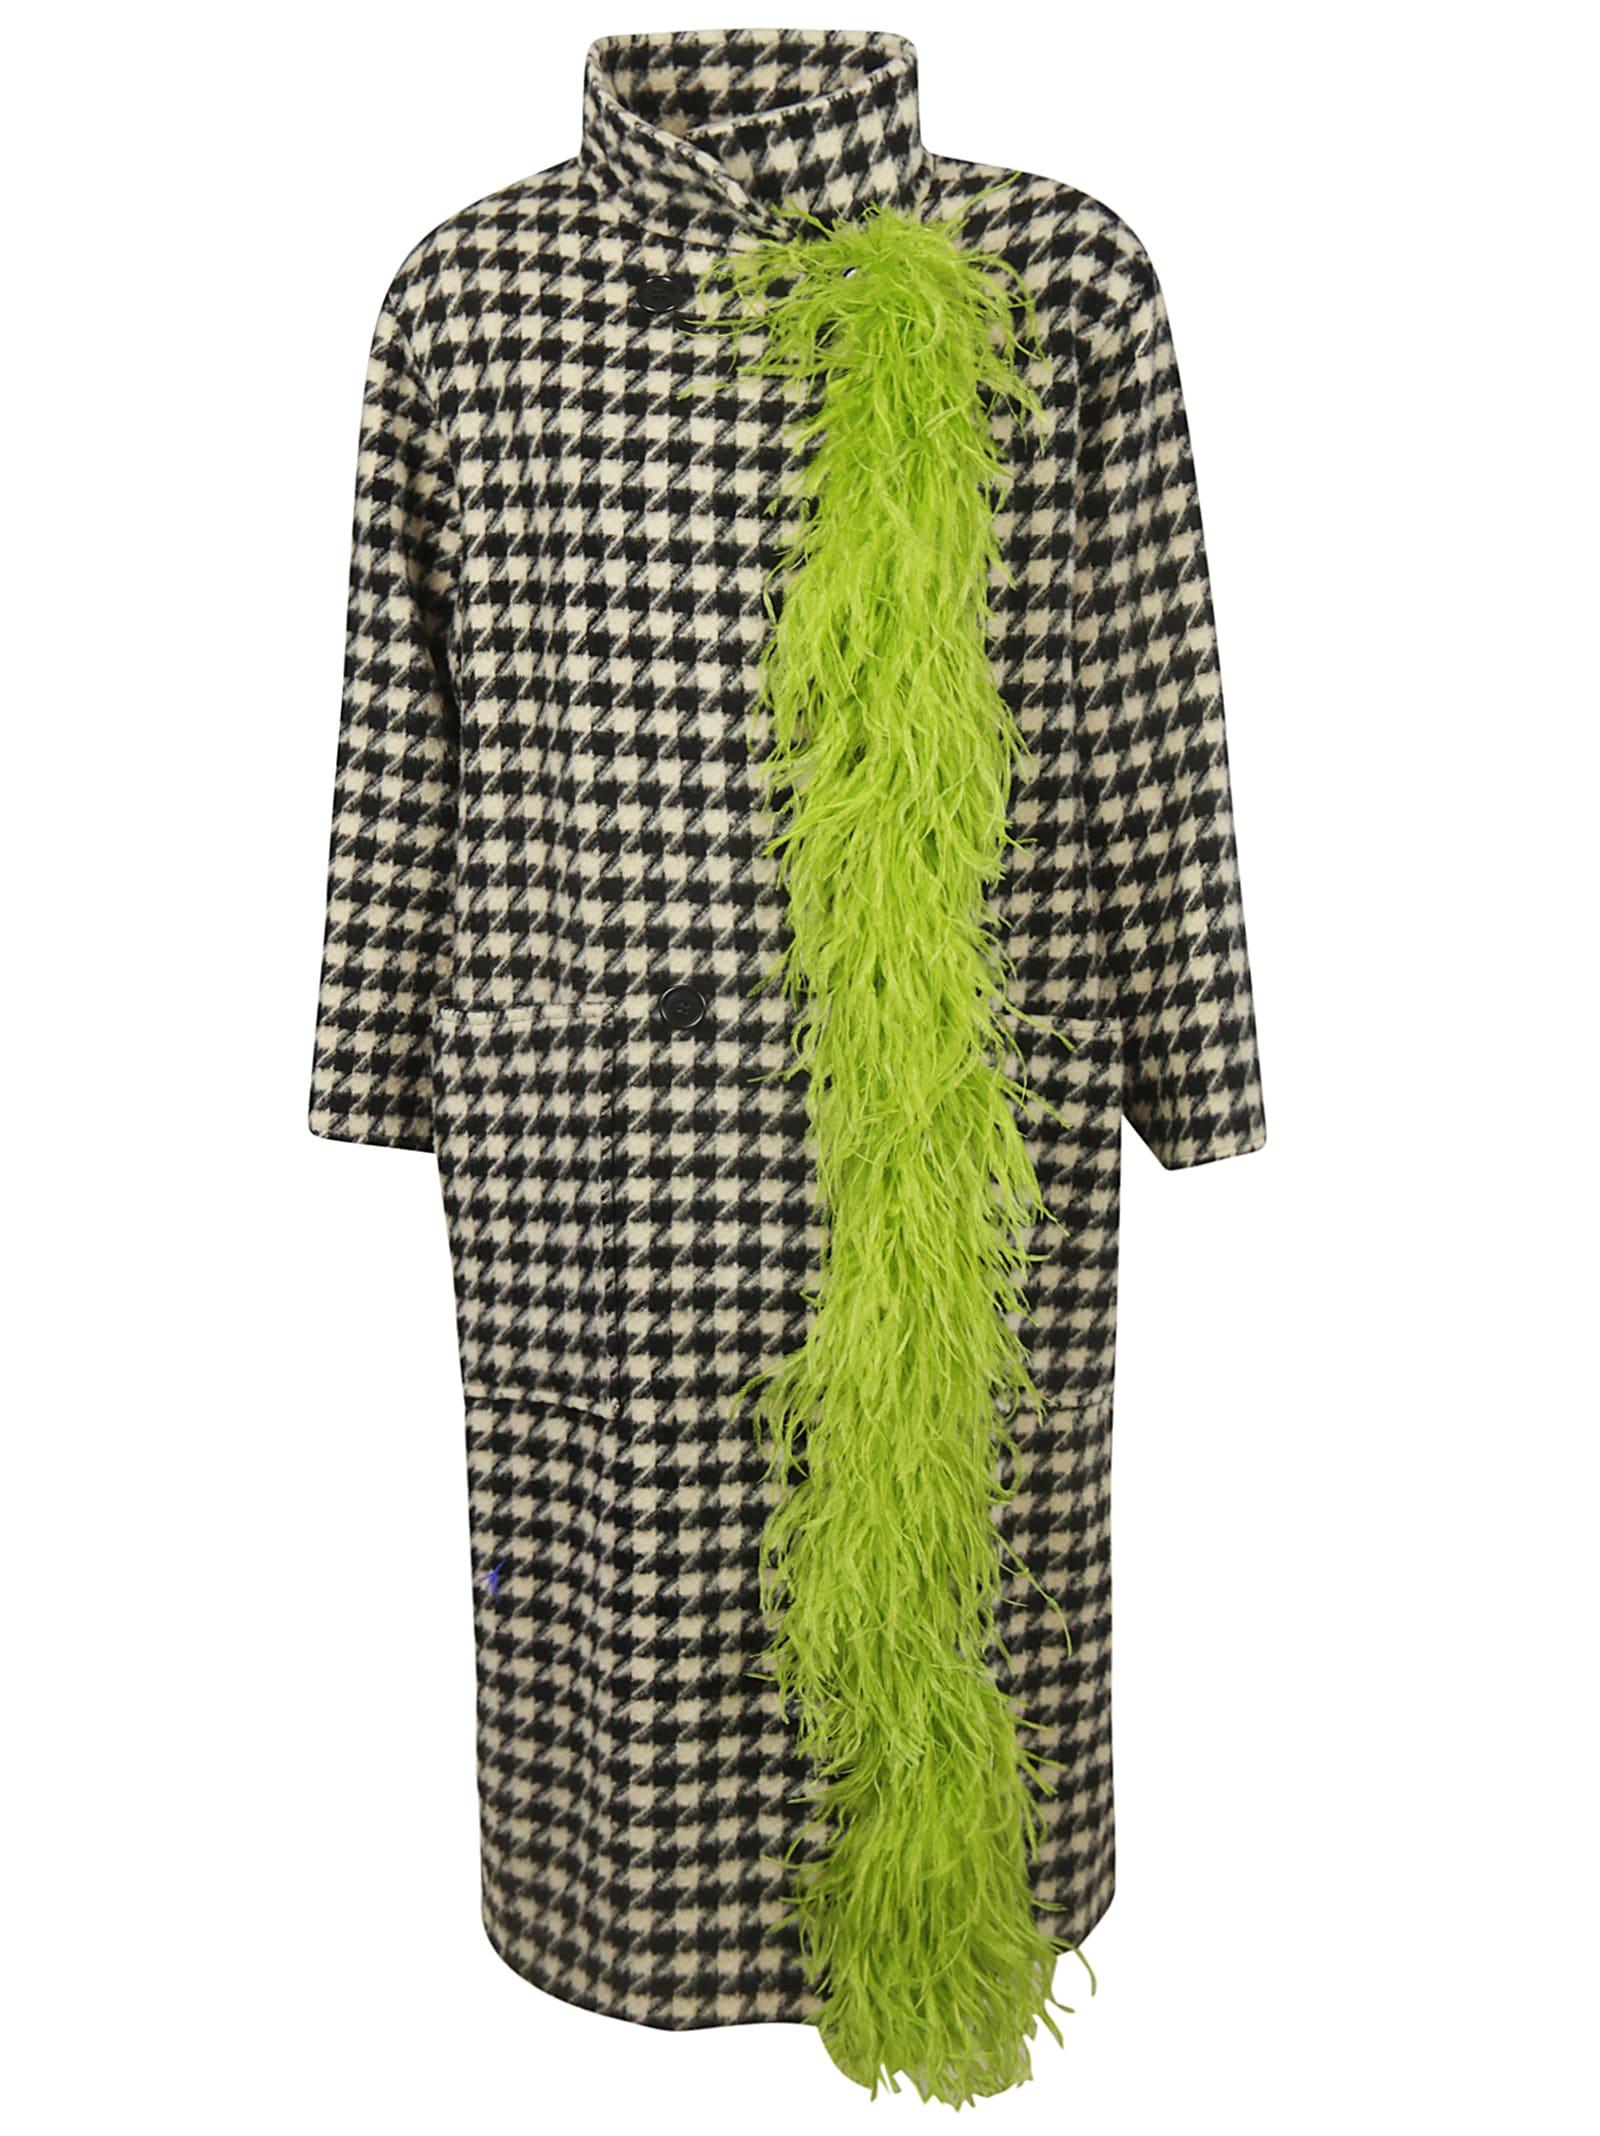 Photo of  Dauphinette Magnolia Coat- shop Dauphinette jackets online sales